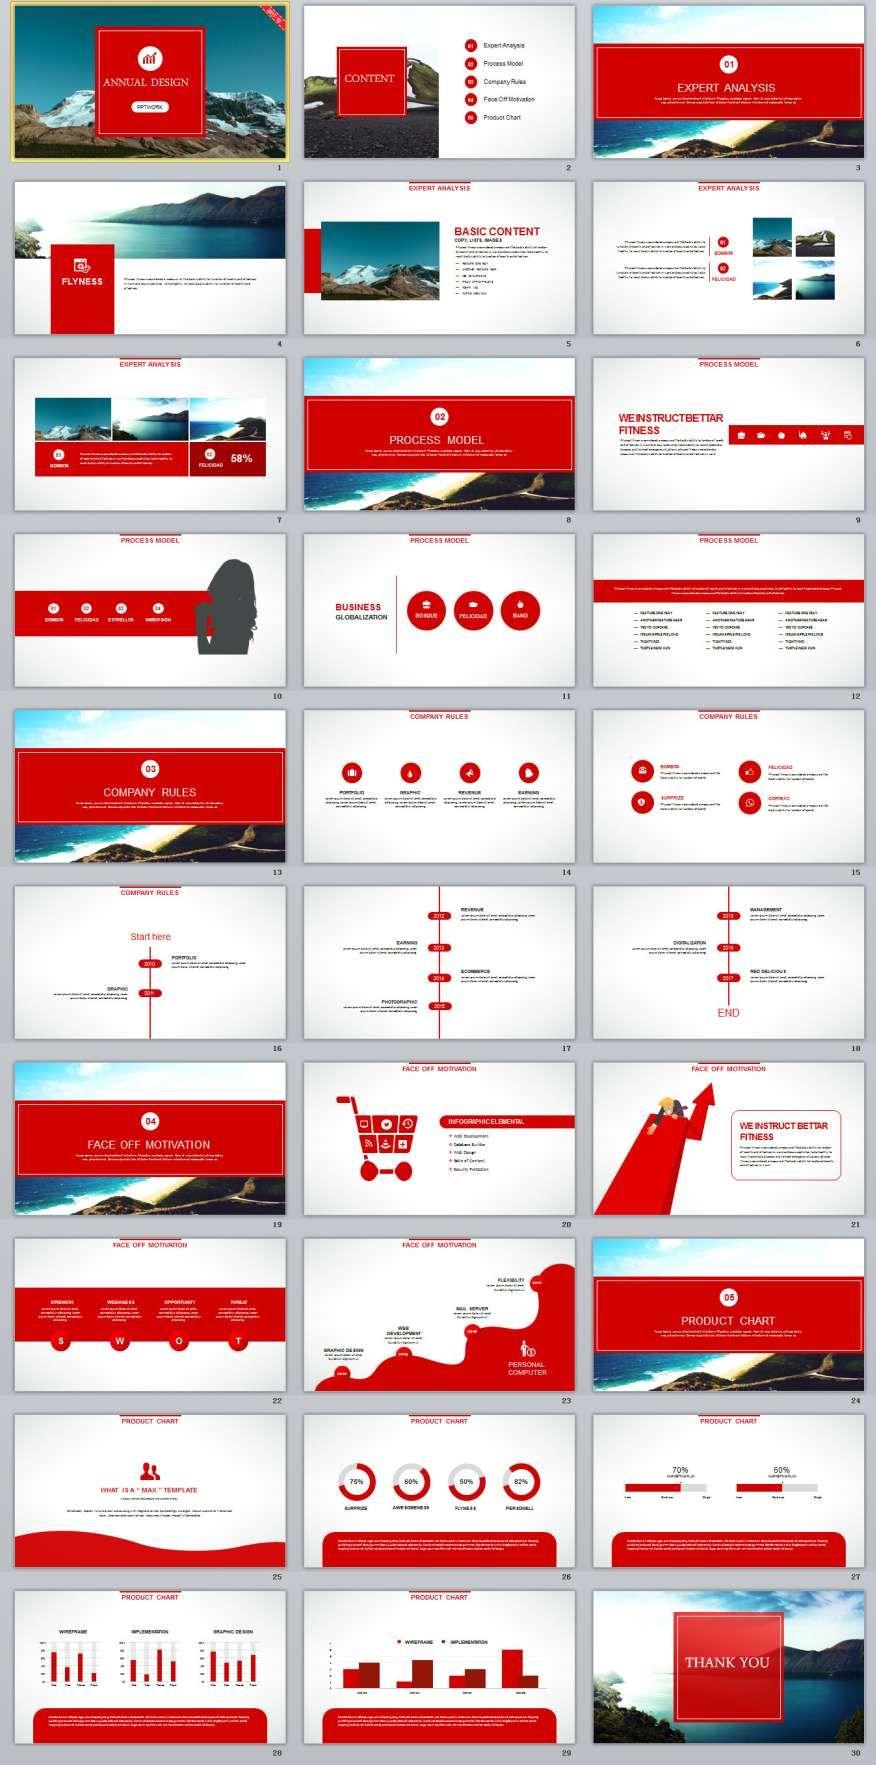 30 red business report powerpoint templates diagramao 30 red business report powerpoint templates the highest quality powerpoint templates and keynote templates download toneelgroepblik Images